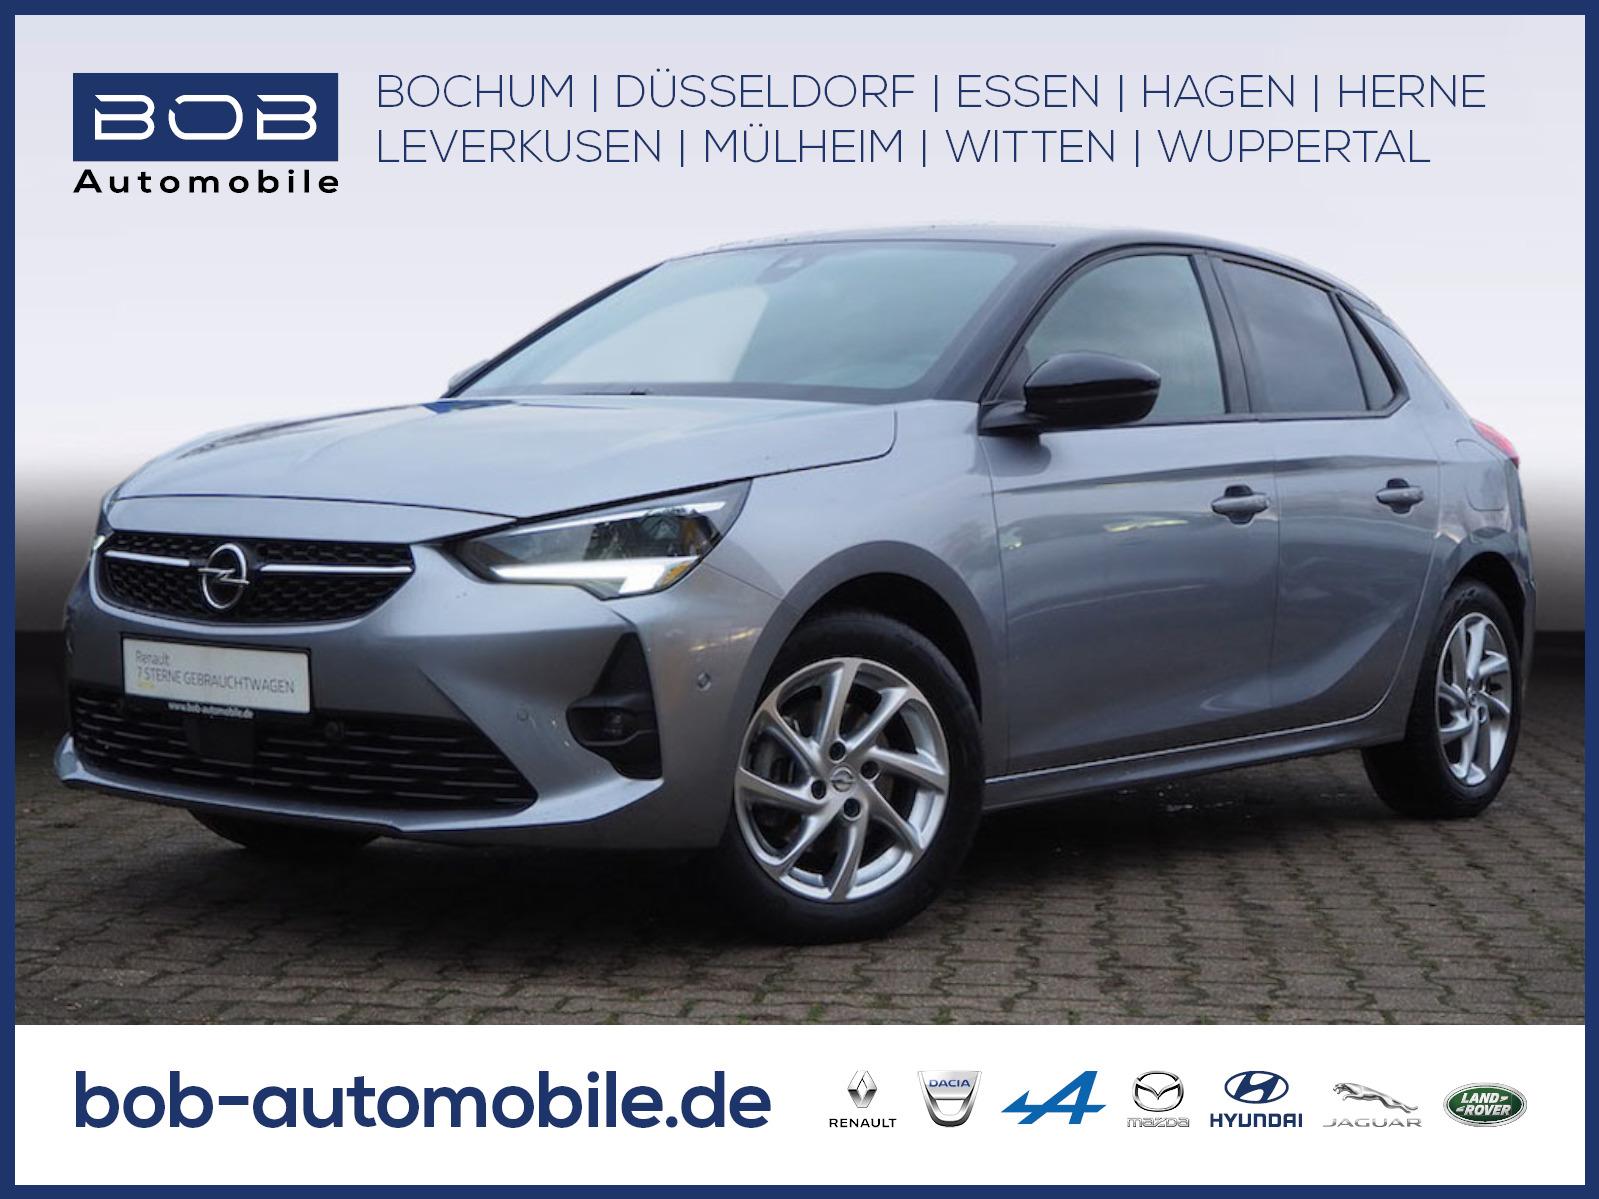 Opel Corsa 1.2 Direct Injection GS Line PDC KLIMA ALU, Jahr 2020, Benzin